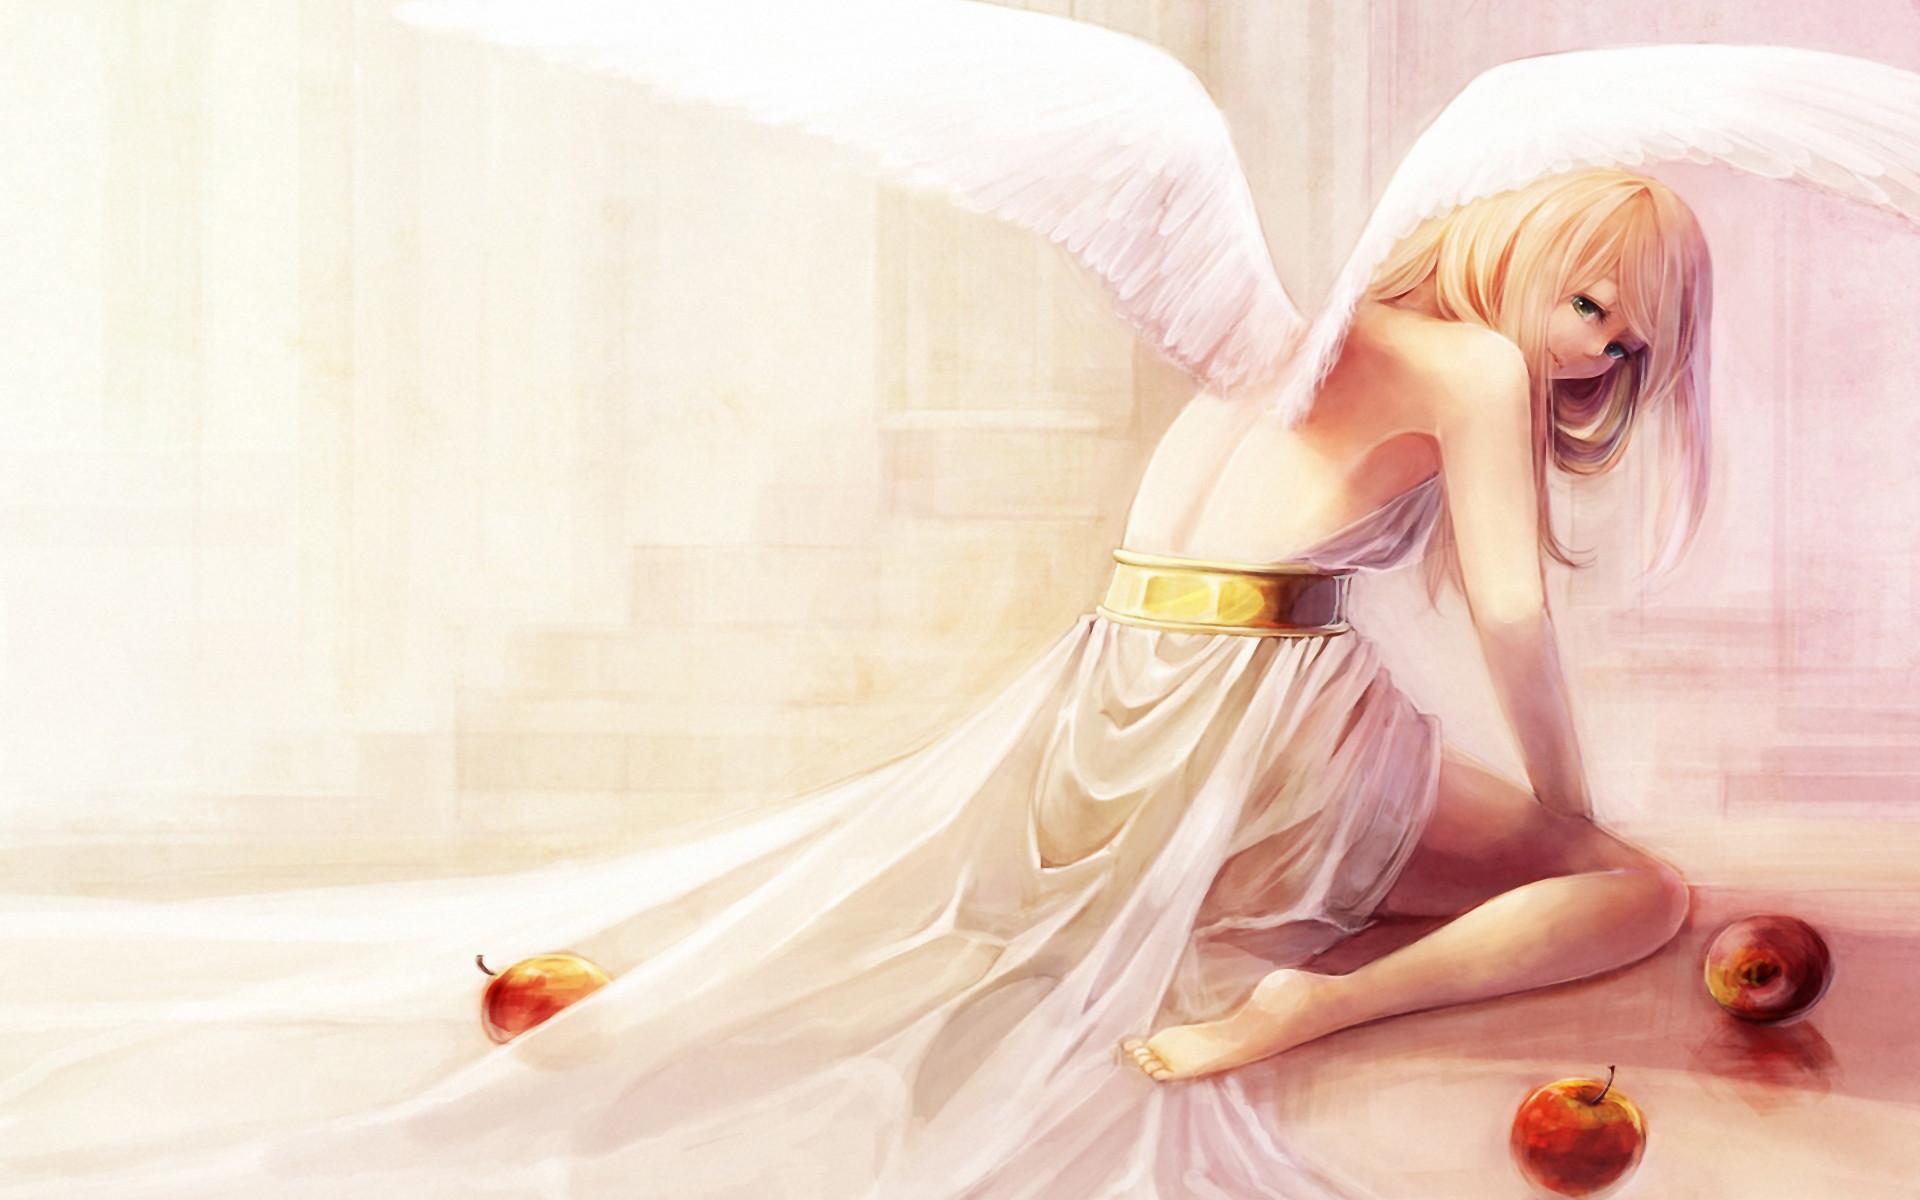 Explore Anime Angel Girl, Anime Girls, and more!